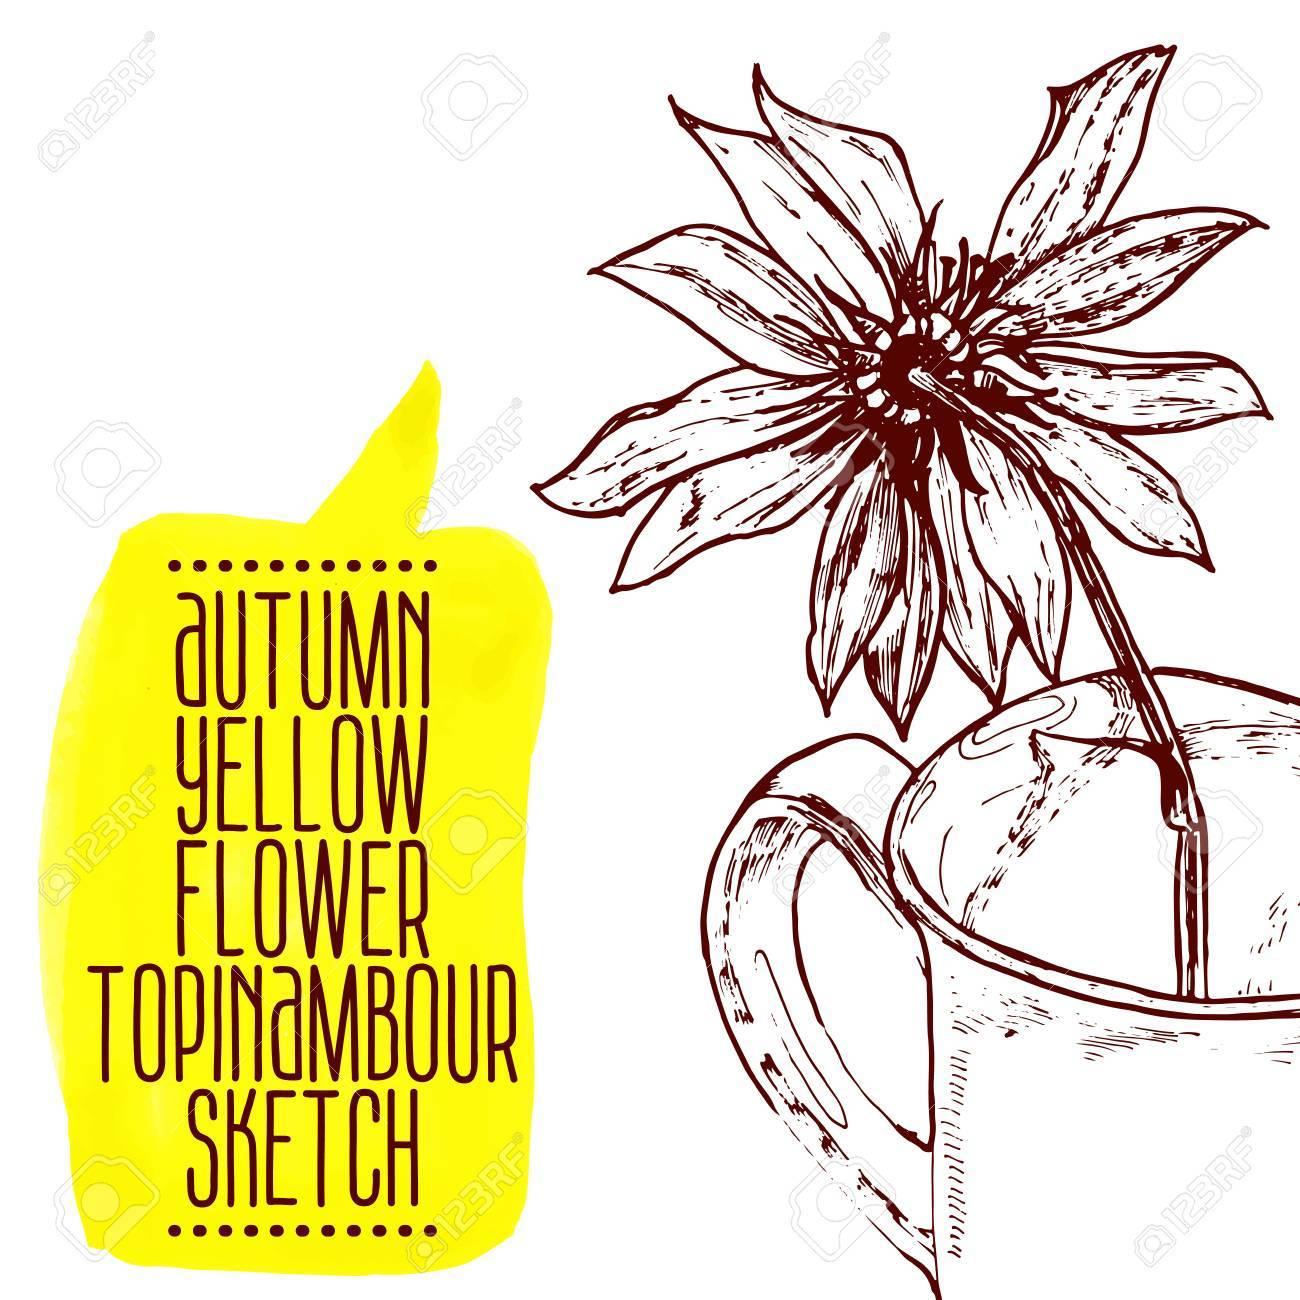 1300x1300 Highly Detailed Hand Drawn Yellow Flower Jerusalem Artichoke